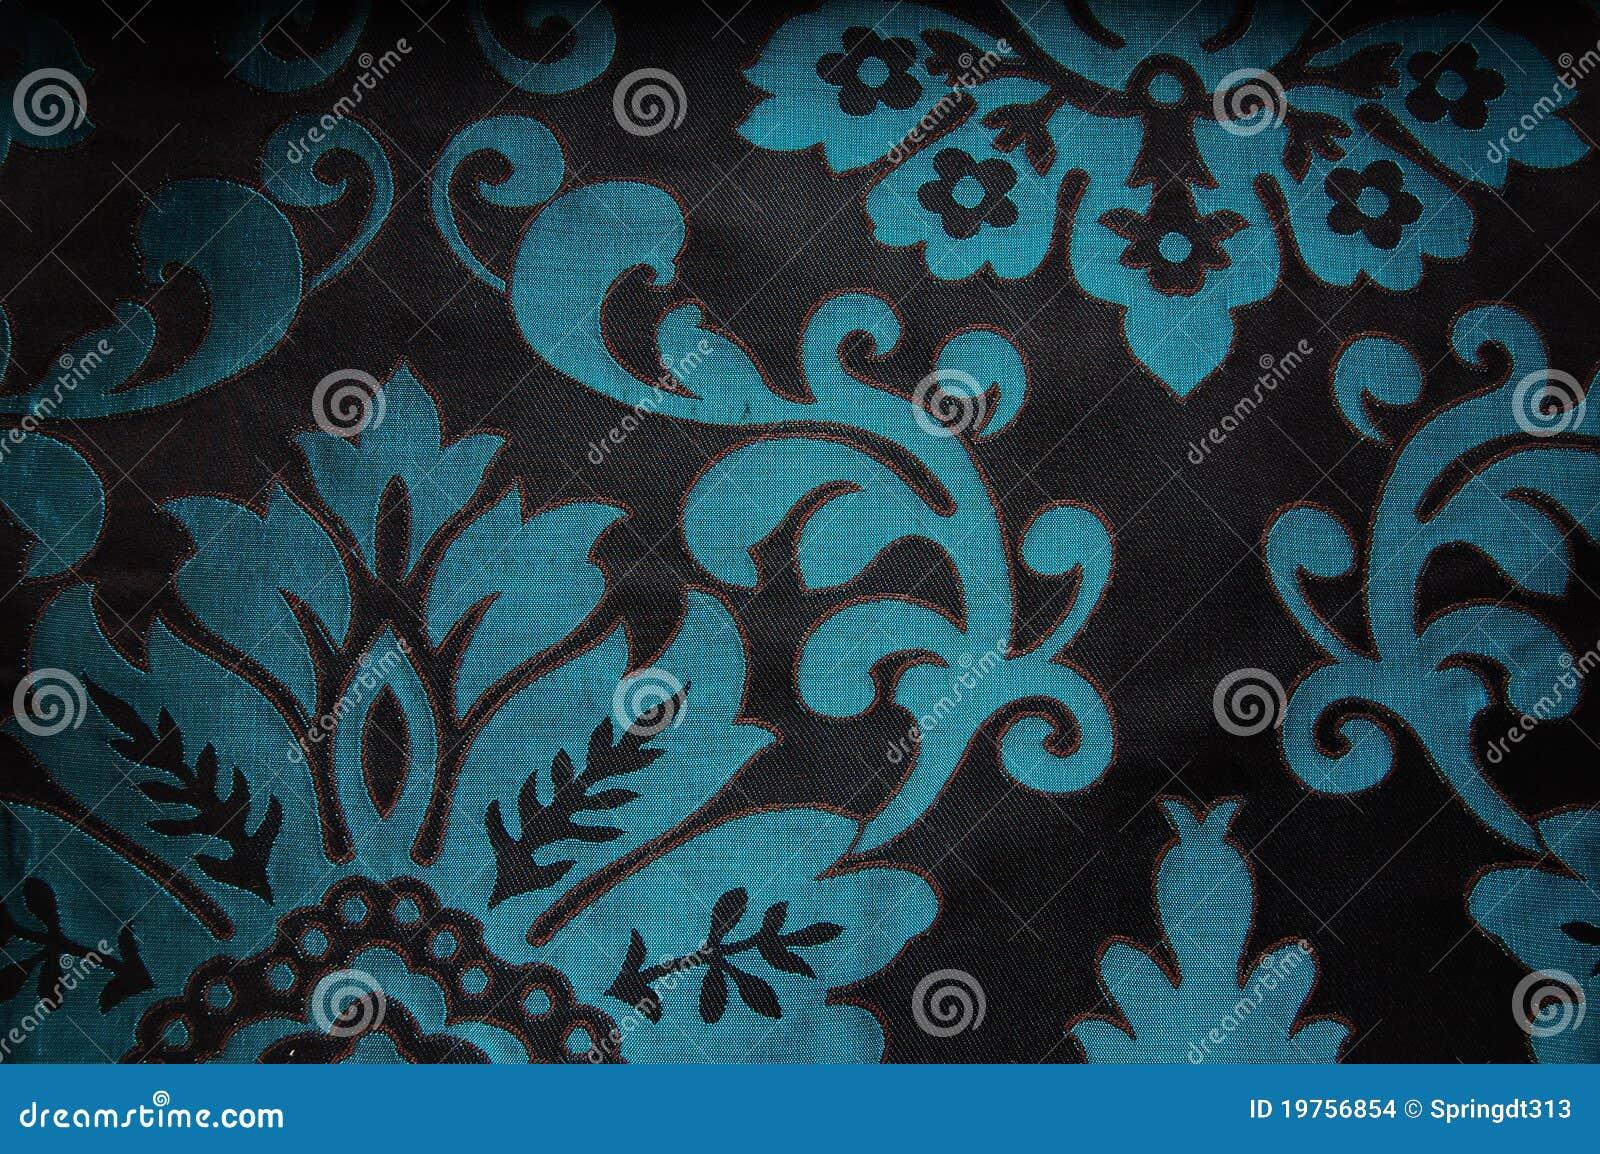 Ancient flower pattern